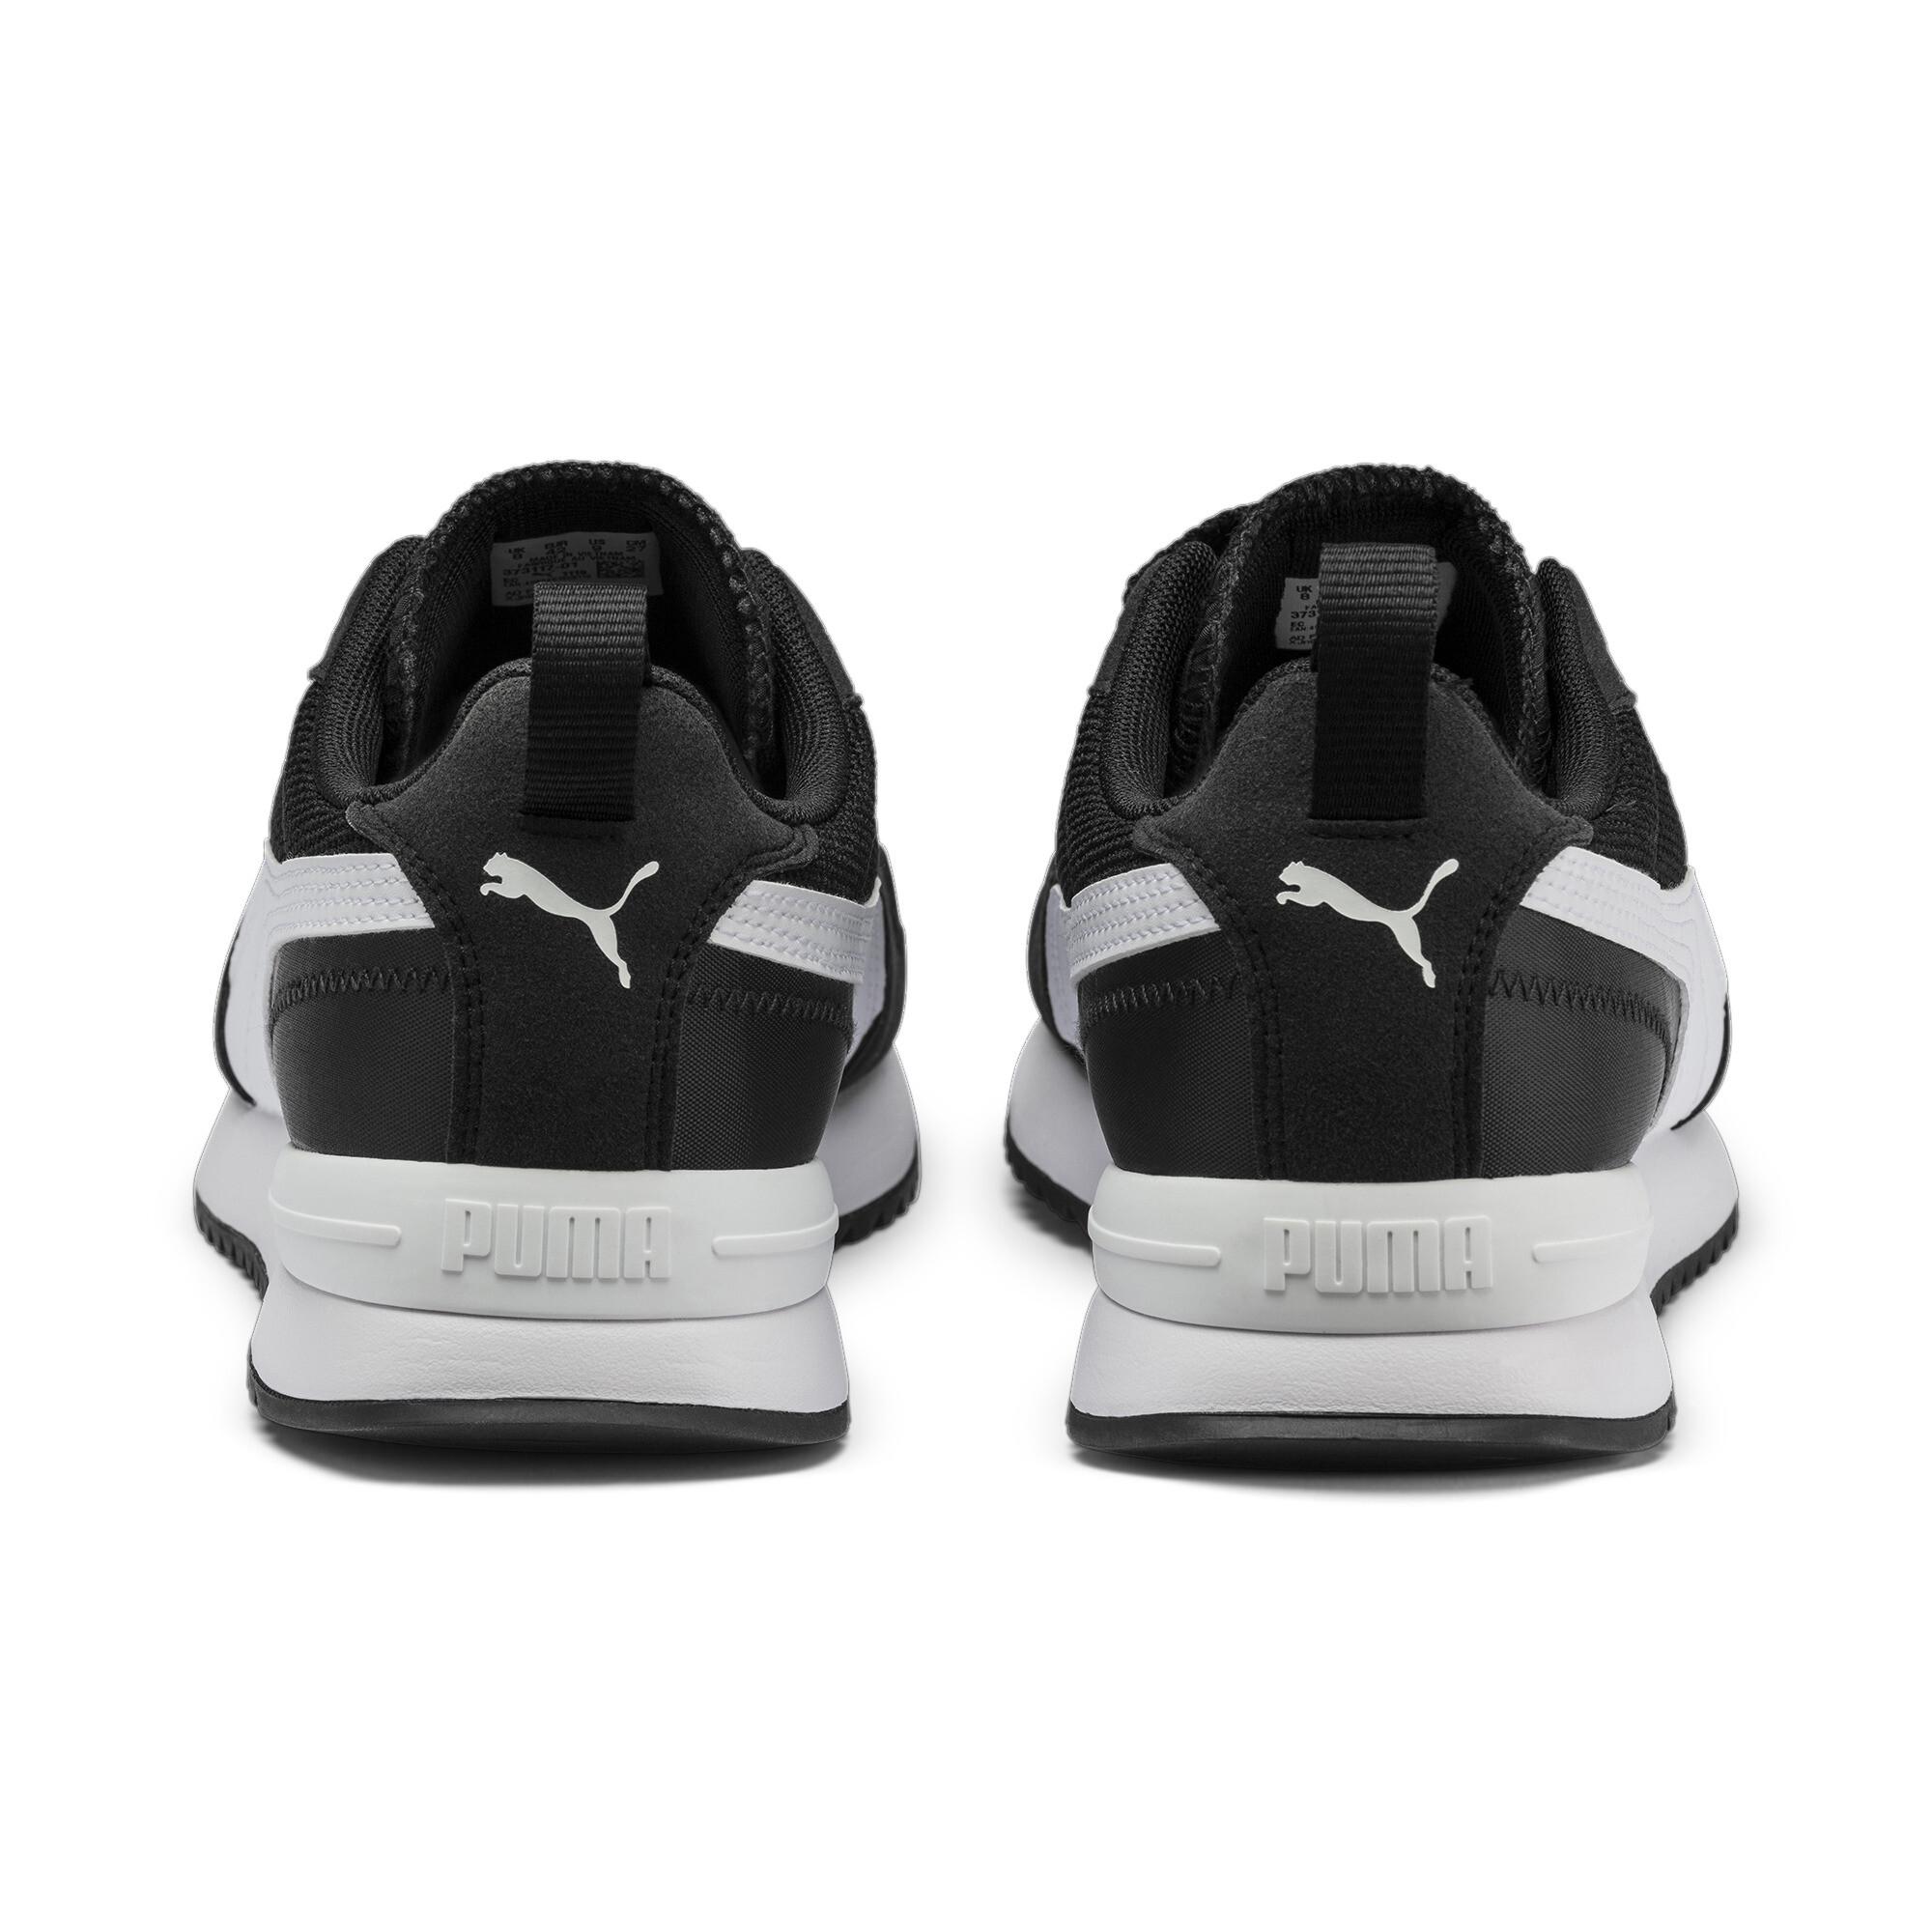 thumbnail 13 - PUMA-Men-039-s-R78-Sneakers